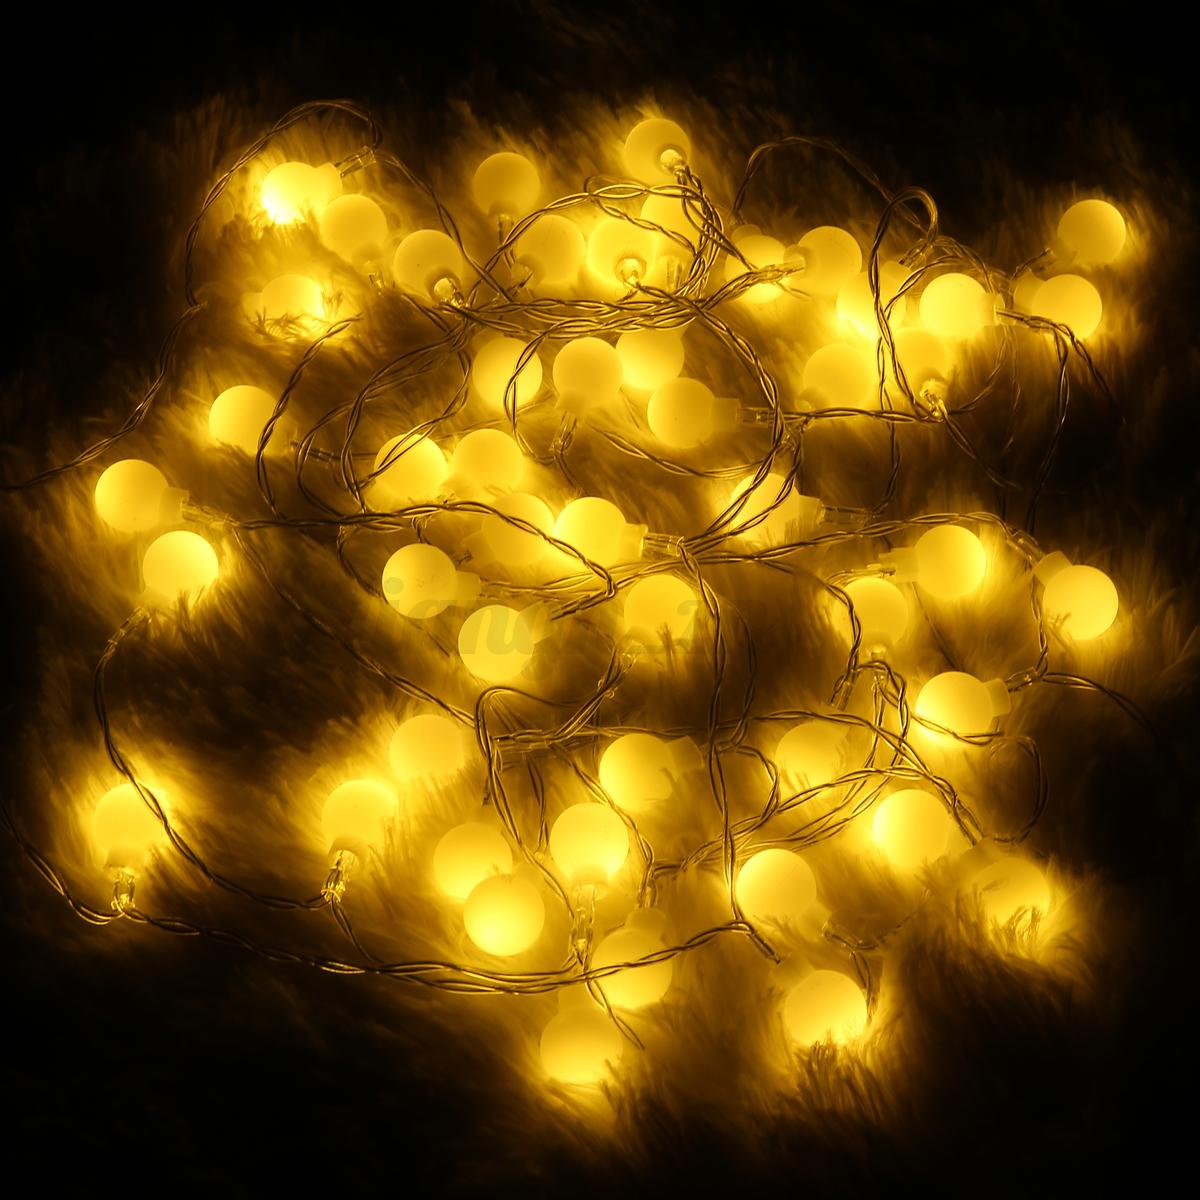 10 320 led guirlande lumineuse jardin f e lampe etanche mariage f te no l d cor ebay. Black Bedroom Furniture Sets. Home Design Ideas